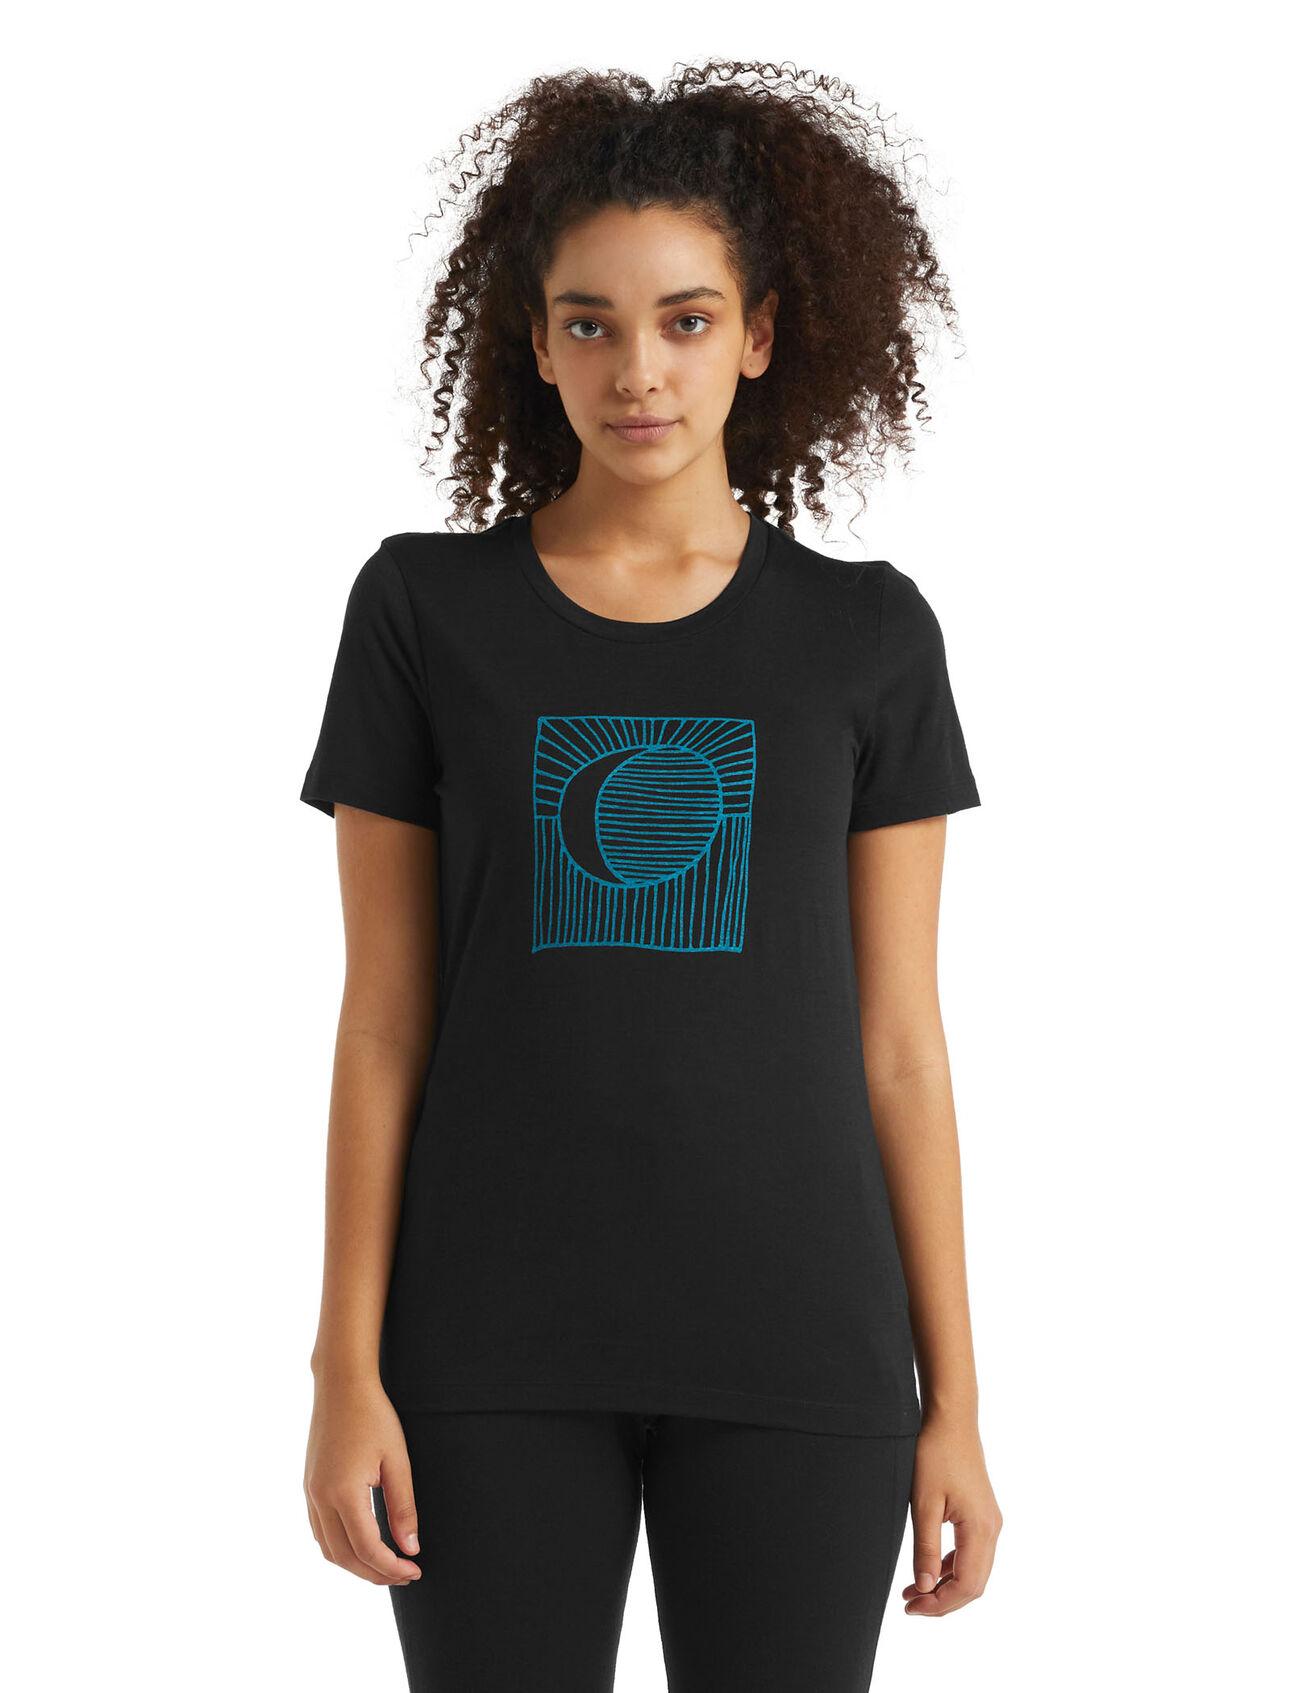 Merino Tech Lite II Short Sleeve T-Shirt Nature's Orb